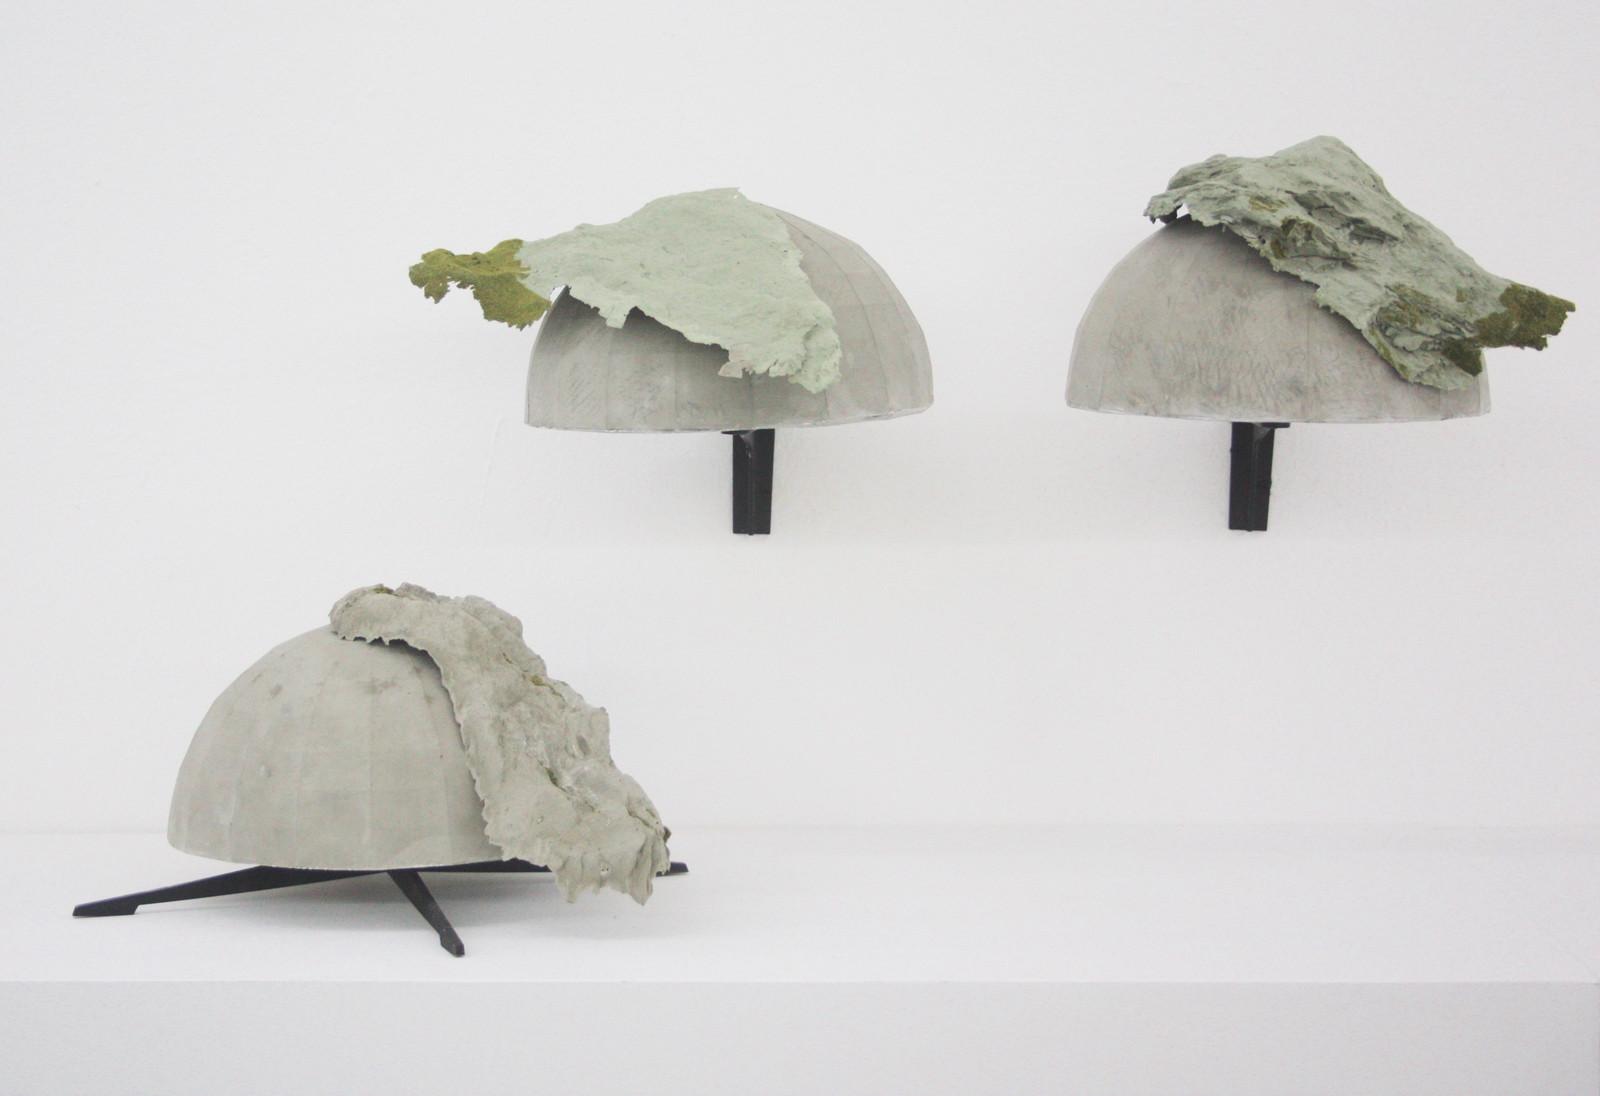 Katleen Vinck, f3.42, f3.51, f3.53, foam, acryl, wood